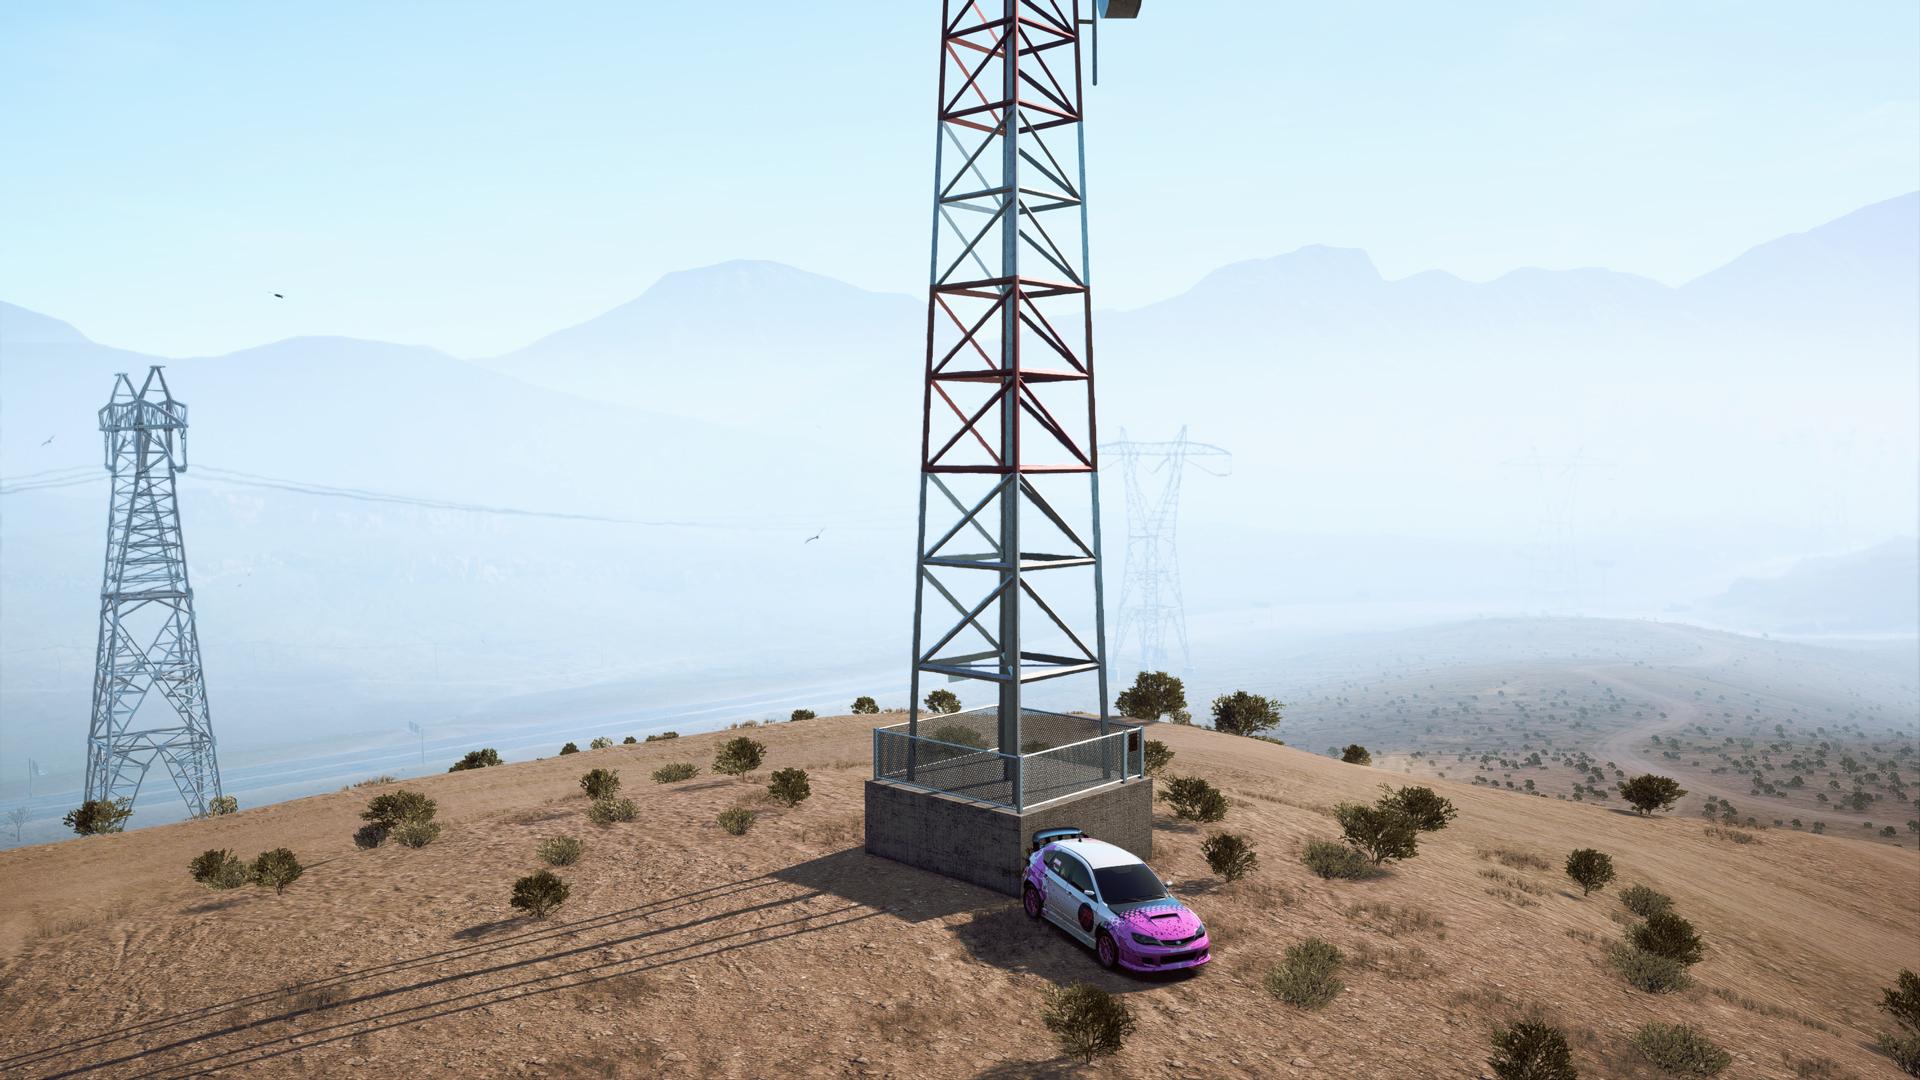 Radio Tower | Need for Speed Wiki | FANDOM powered by Wikia